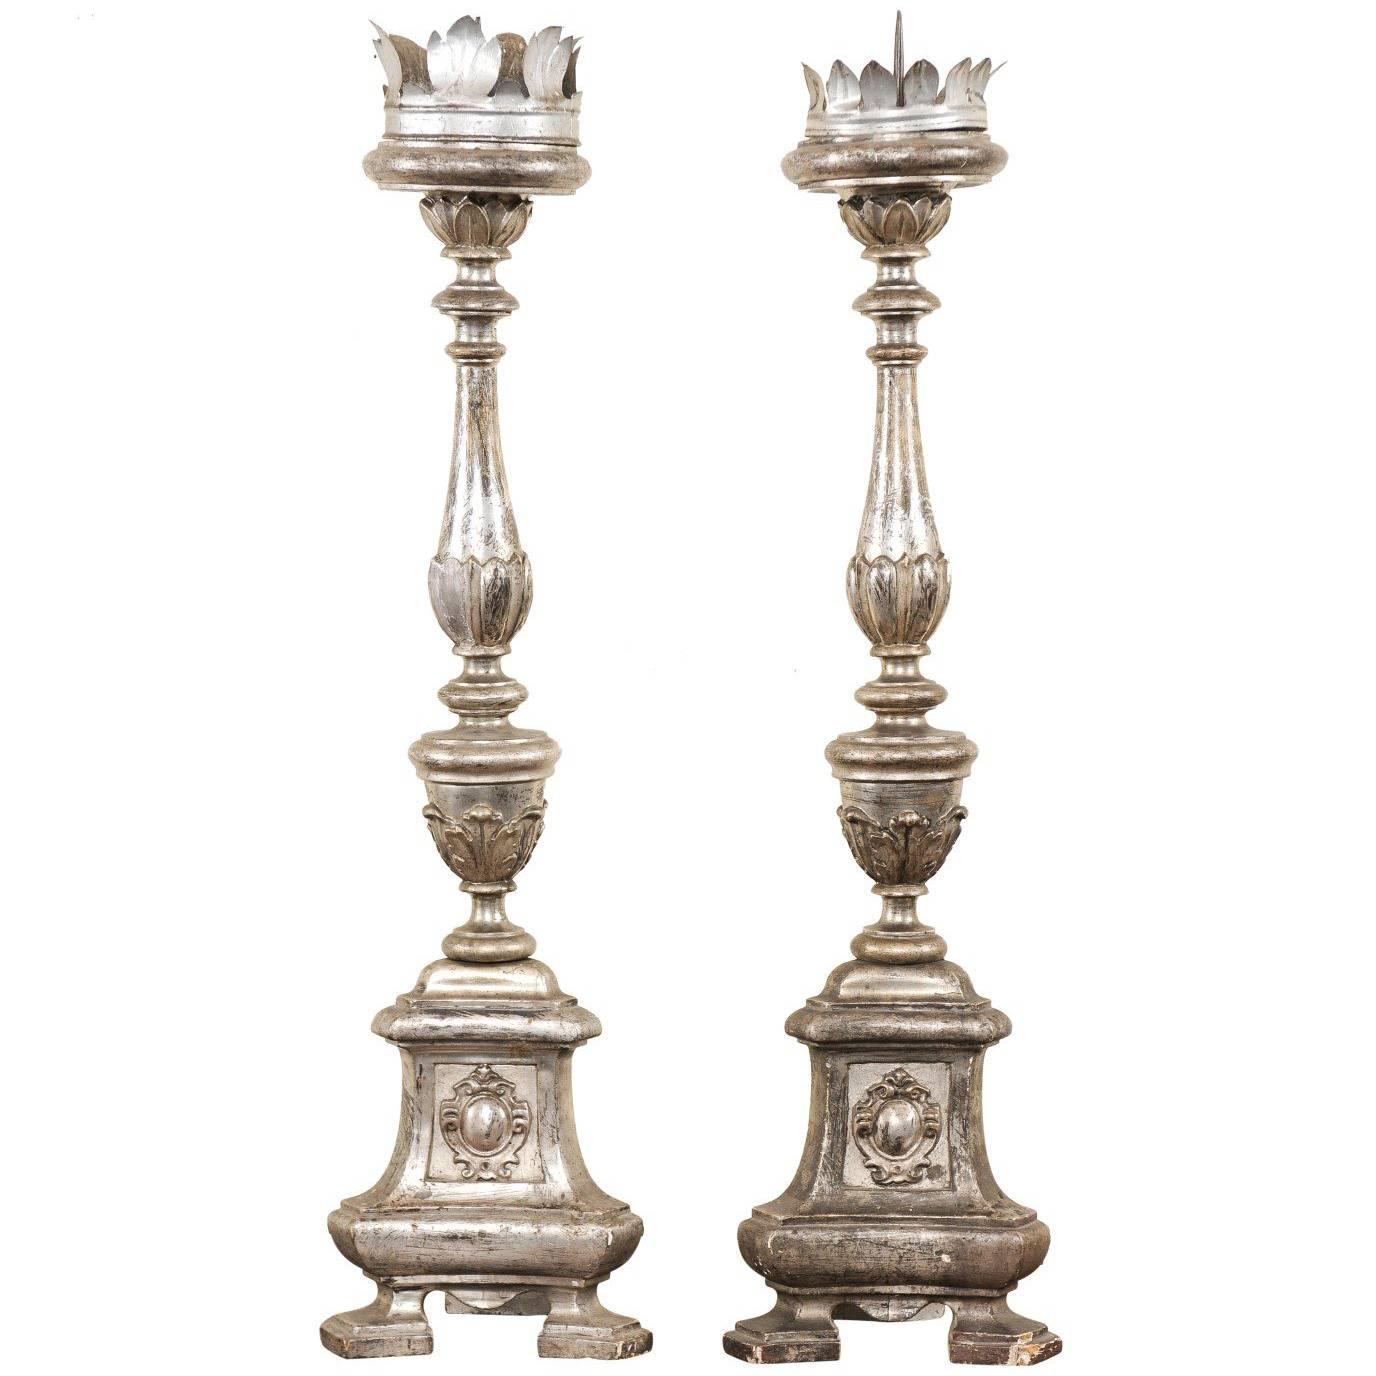 Pair of Tall Italian 19th Century Silver Gilt Candlesticks from Italian Church